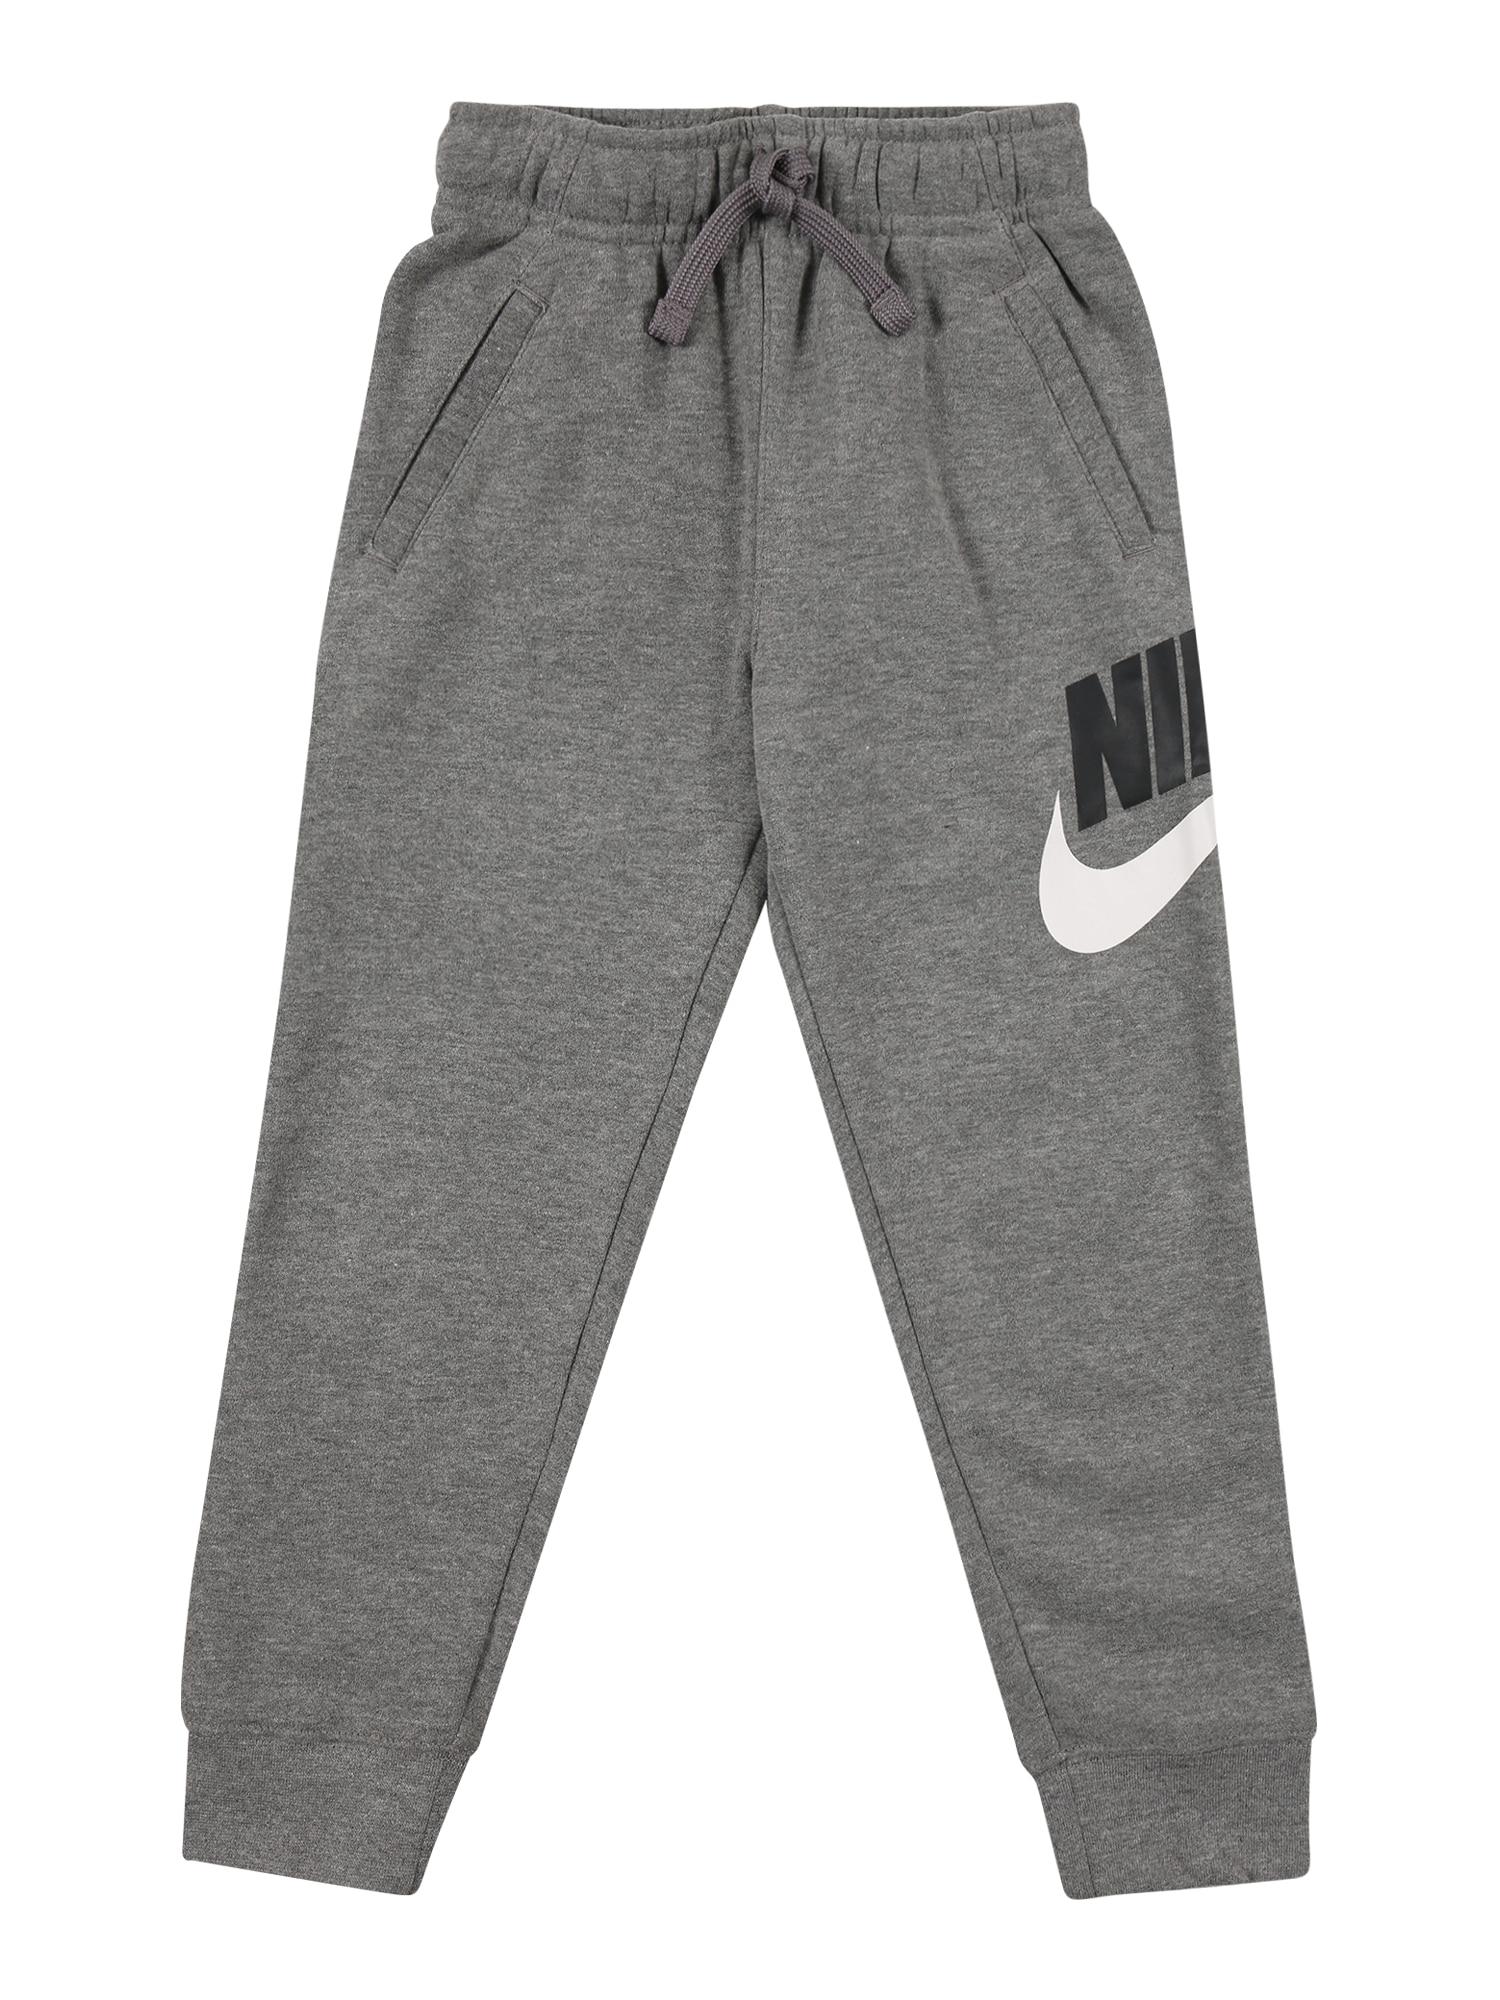 Nike Sportswear Kelnės balta / pilka / juoda